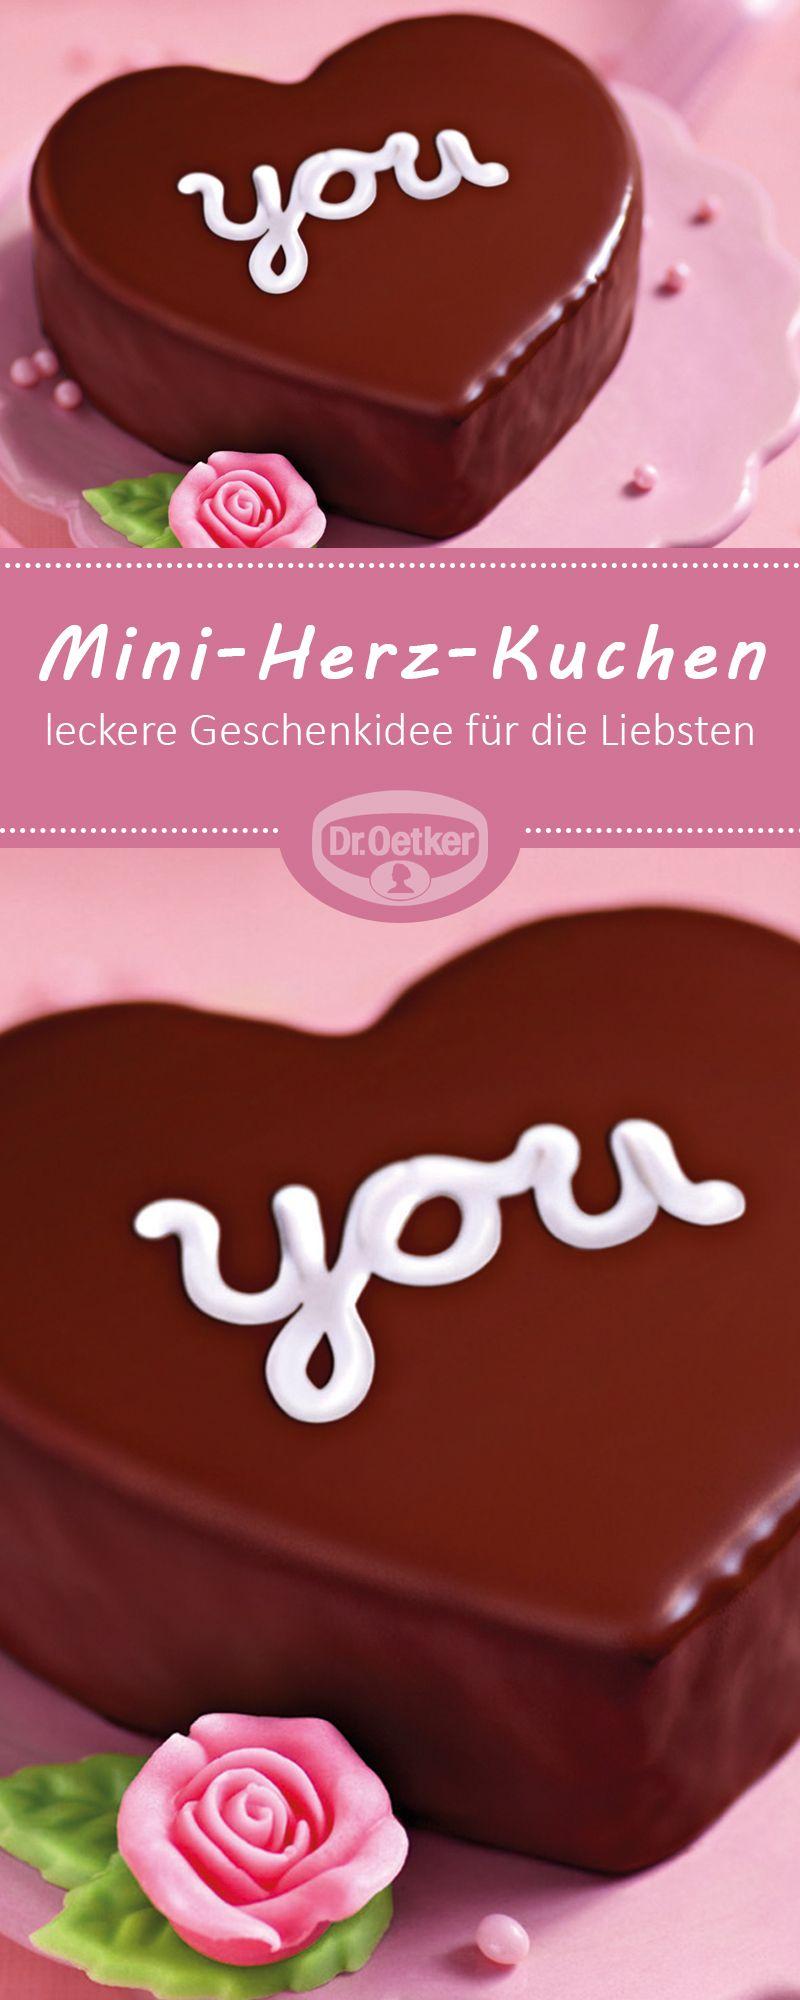 Mini Herz Kuchen Rezept Alles Liebe Zum Valentinstag Kuchen